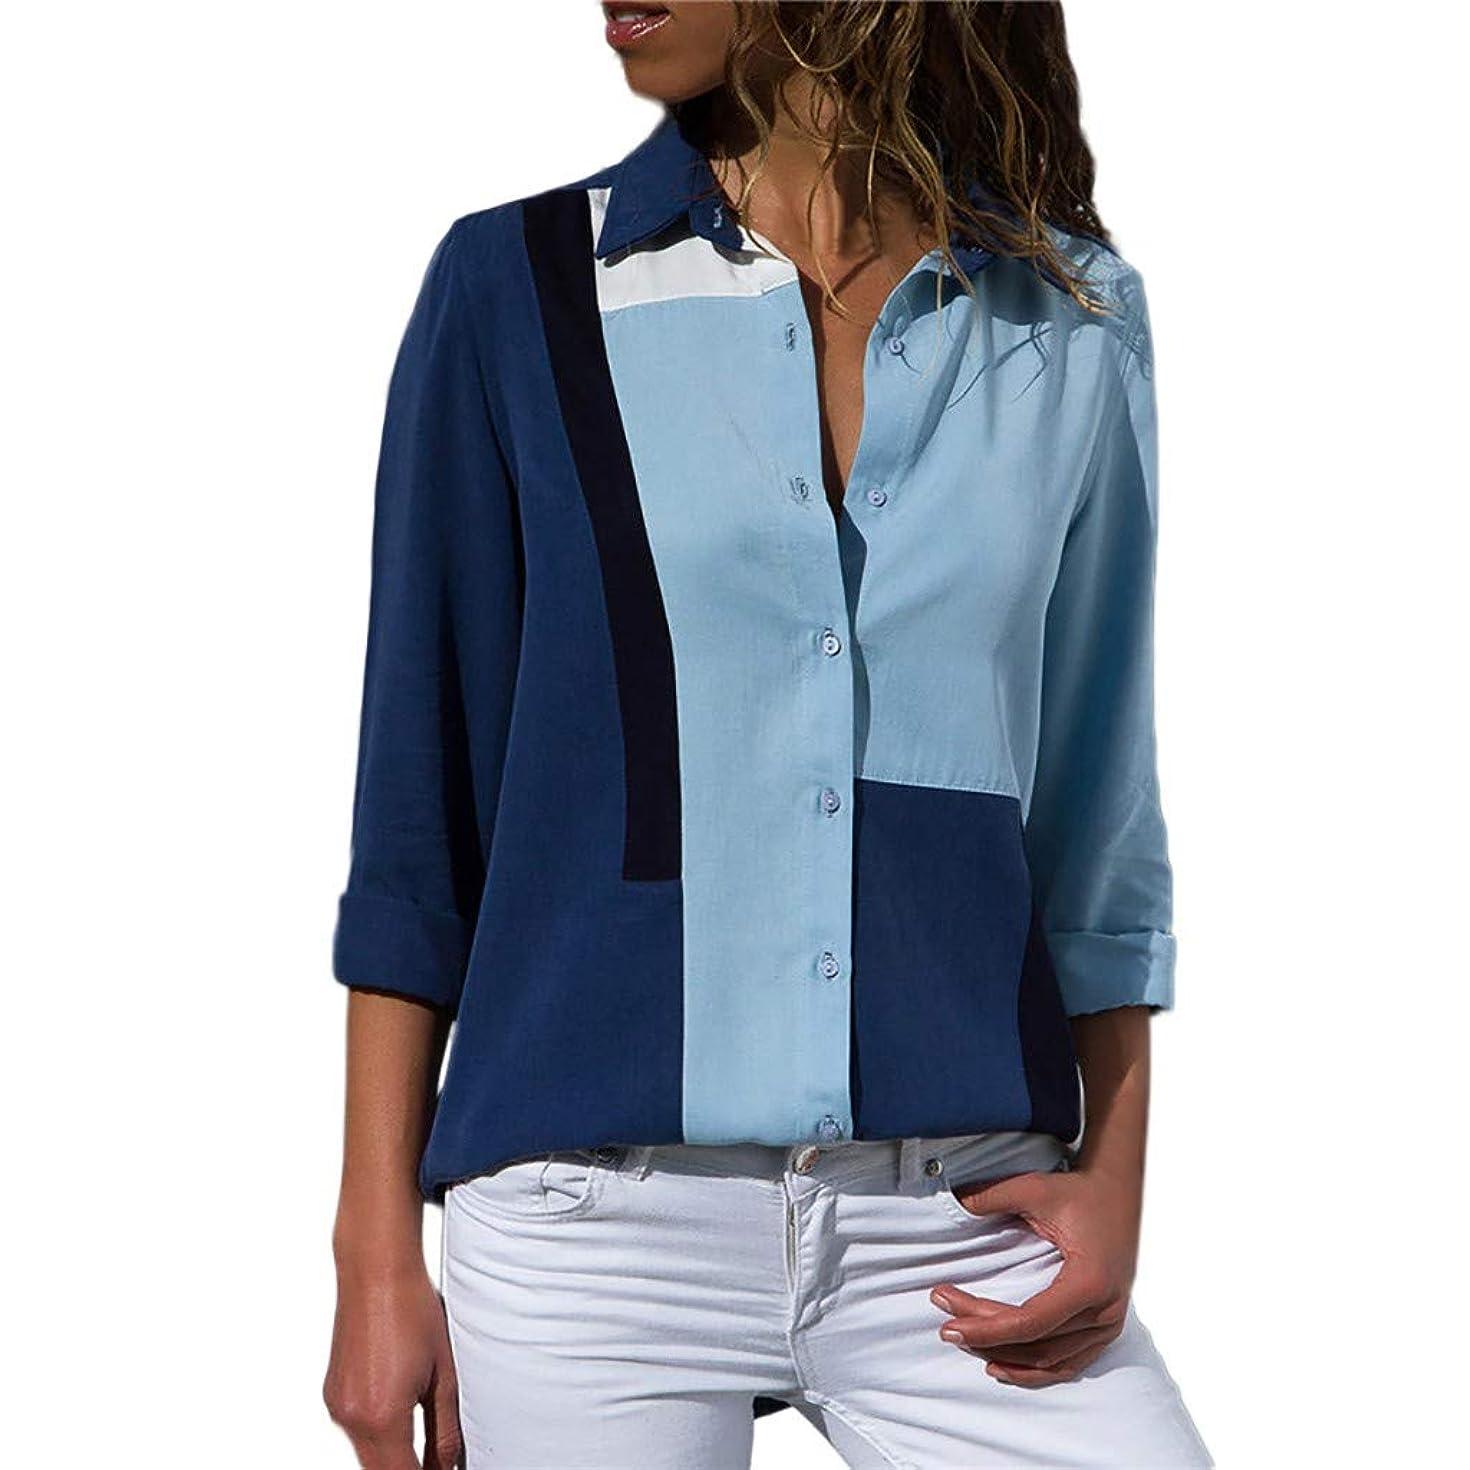 Women's Blouses Fashion 2019,Wugeshangmao Button Up Striped T-Shirt Long Sleeve Plus Size Tops Tunic Pollover Shirt